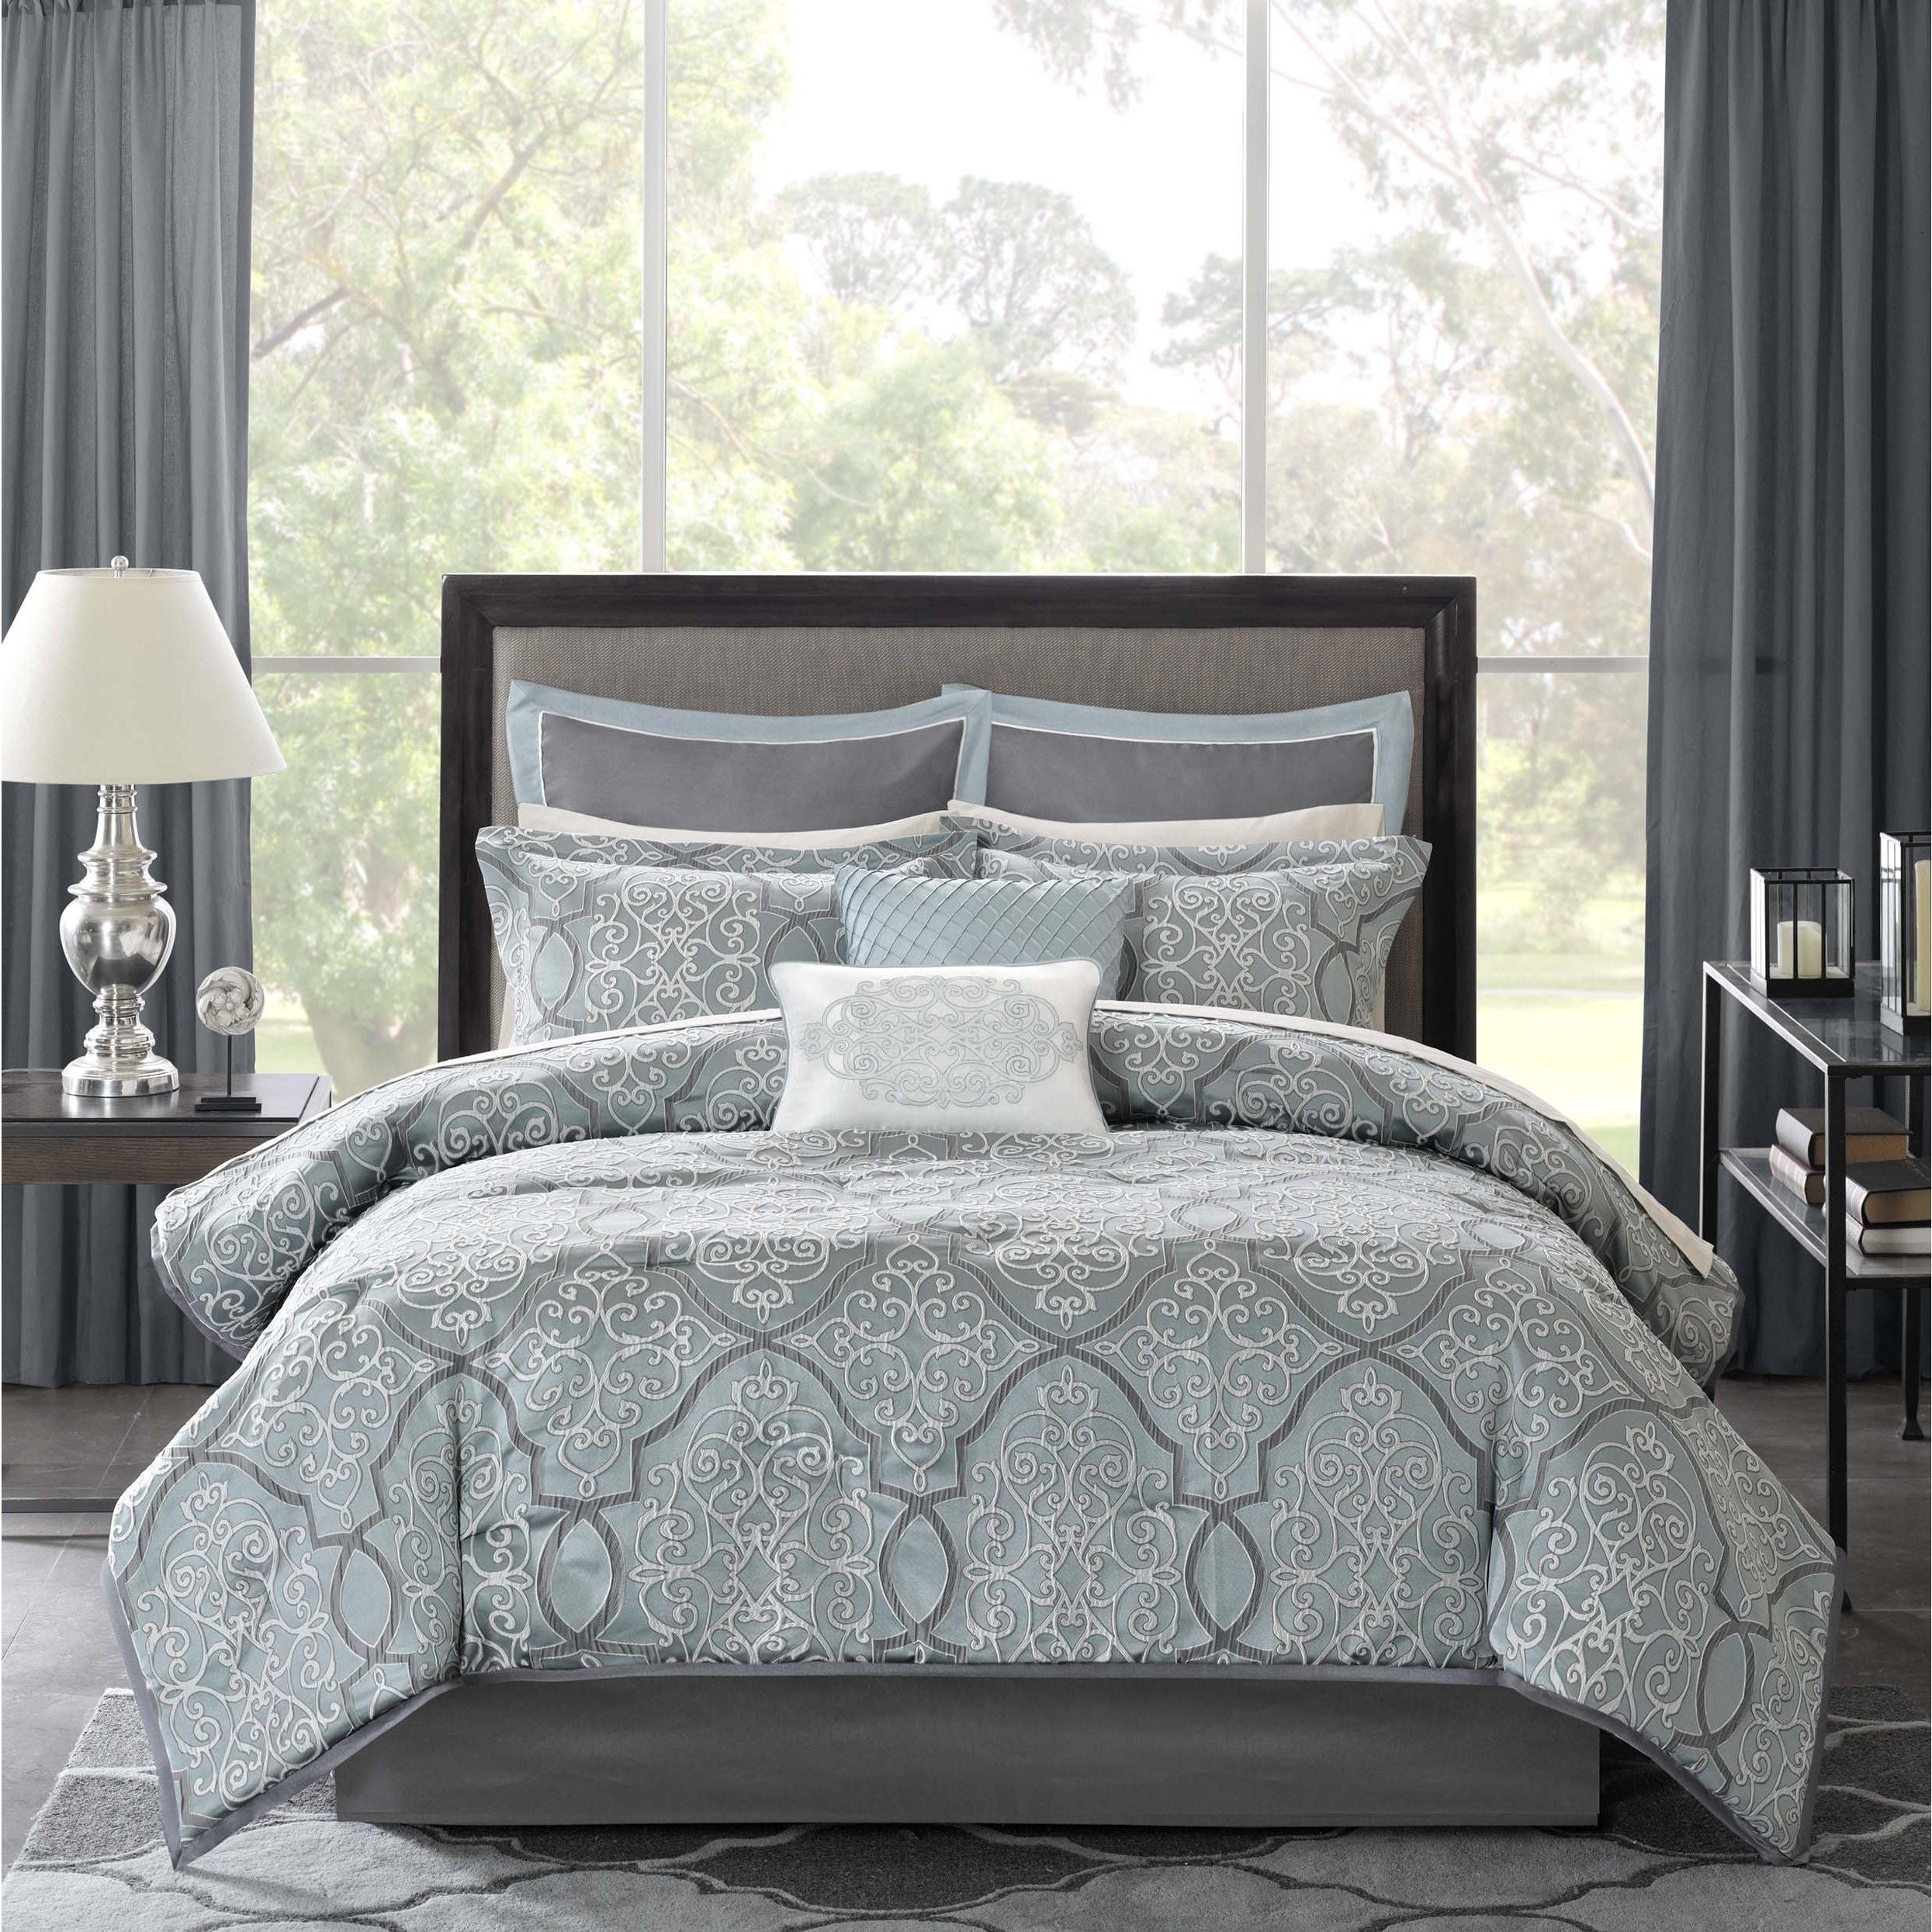 Shop Black Friday Deals On Madison Park Anouk Jacquard 12 Piece Complete Bed Set Overstock 10389807